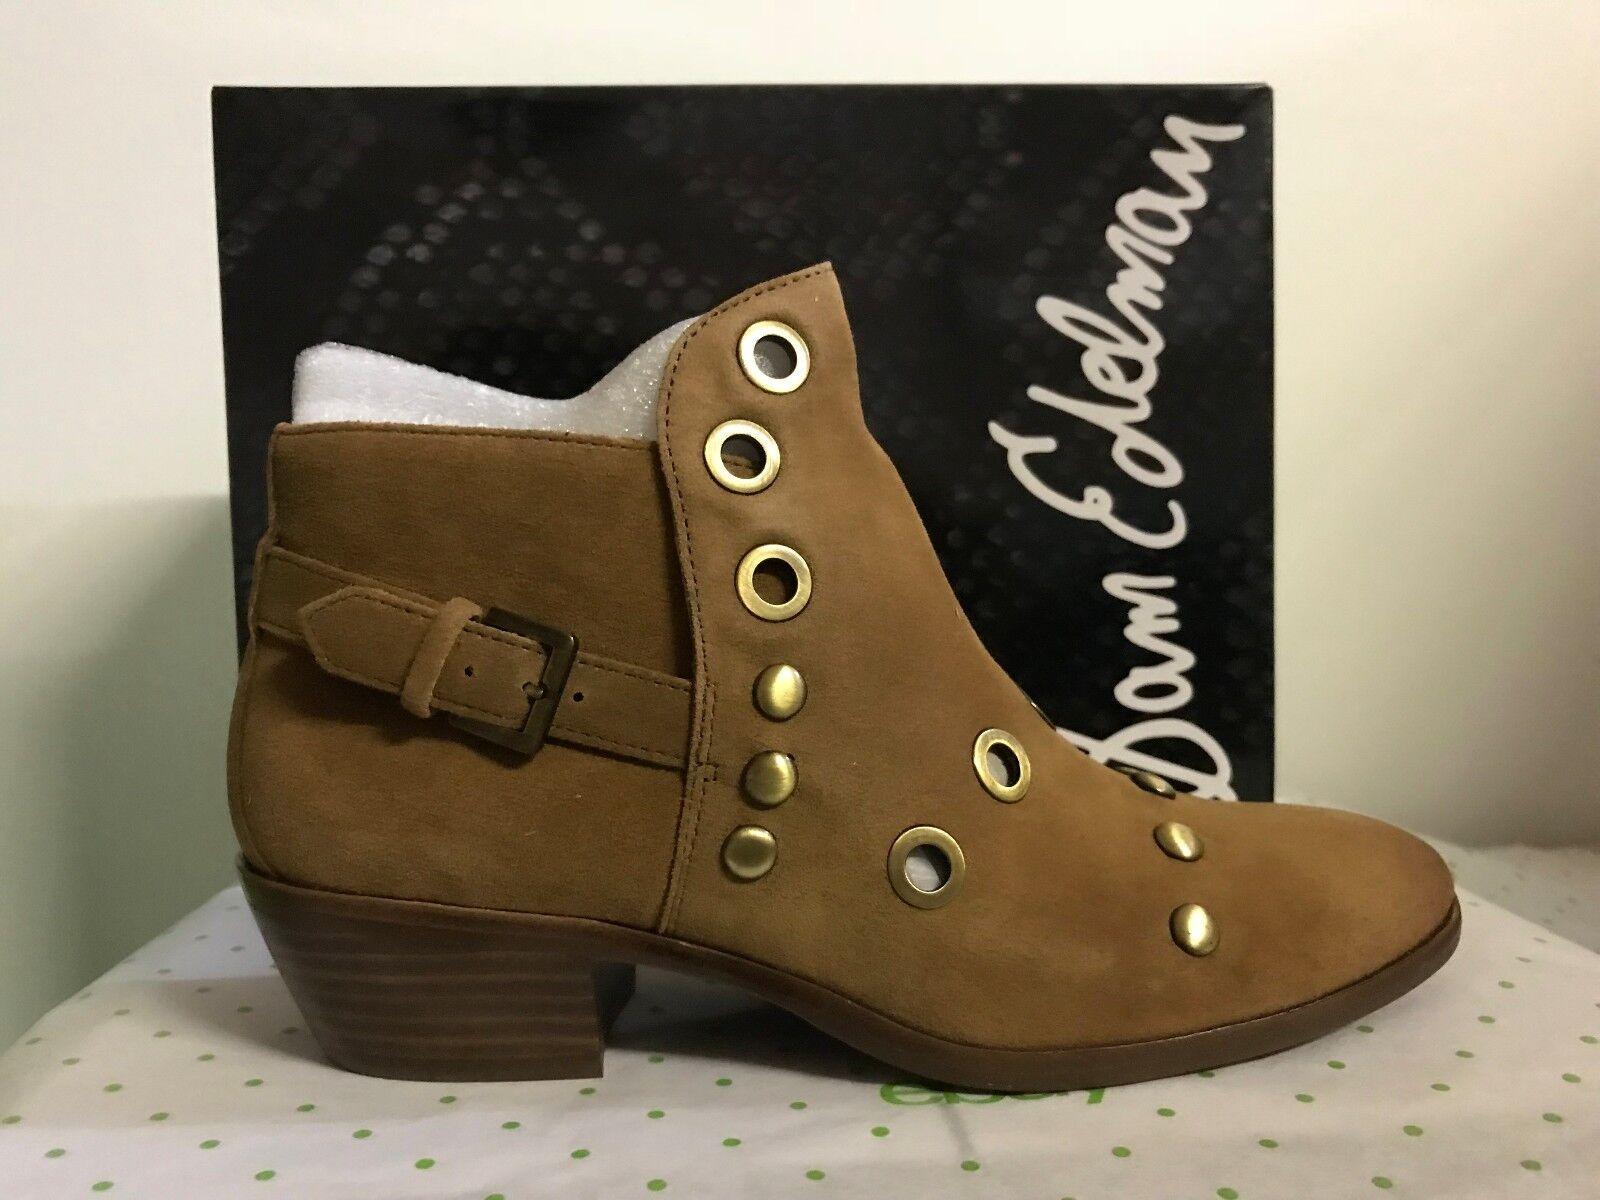 Sam Edelman Pedra Women's Grommet Detail Booties Suede Ankle Boots Brown